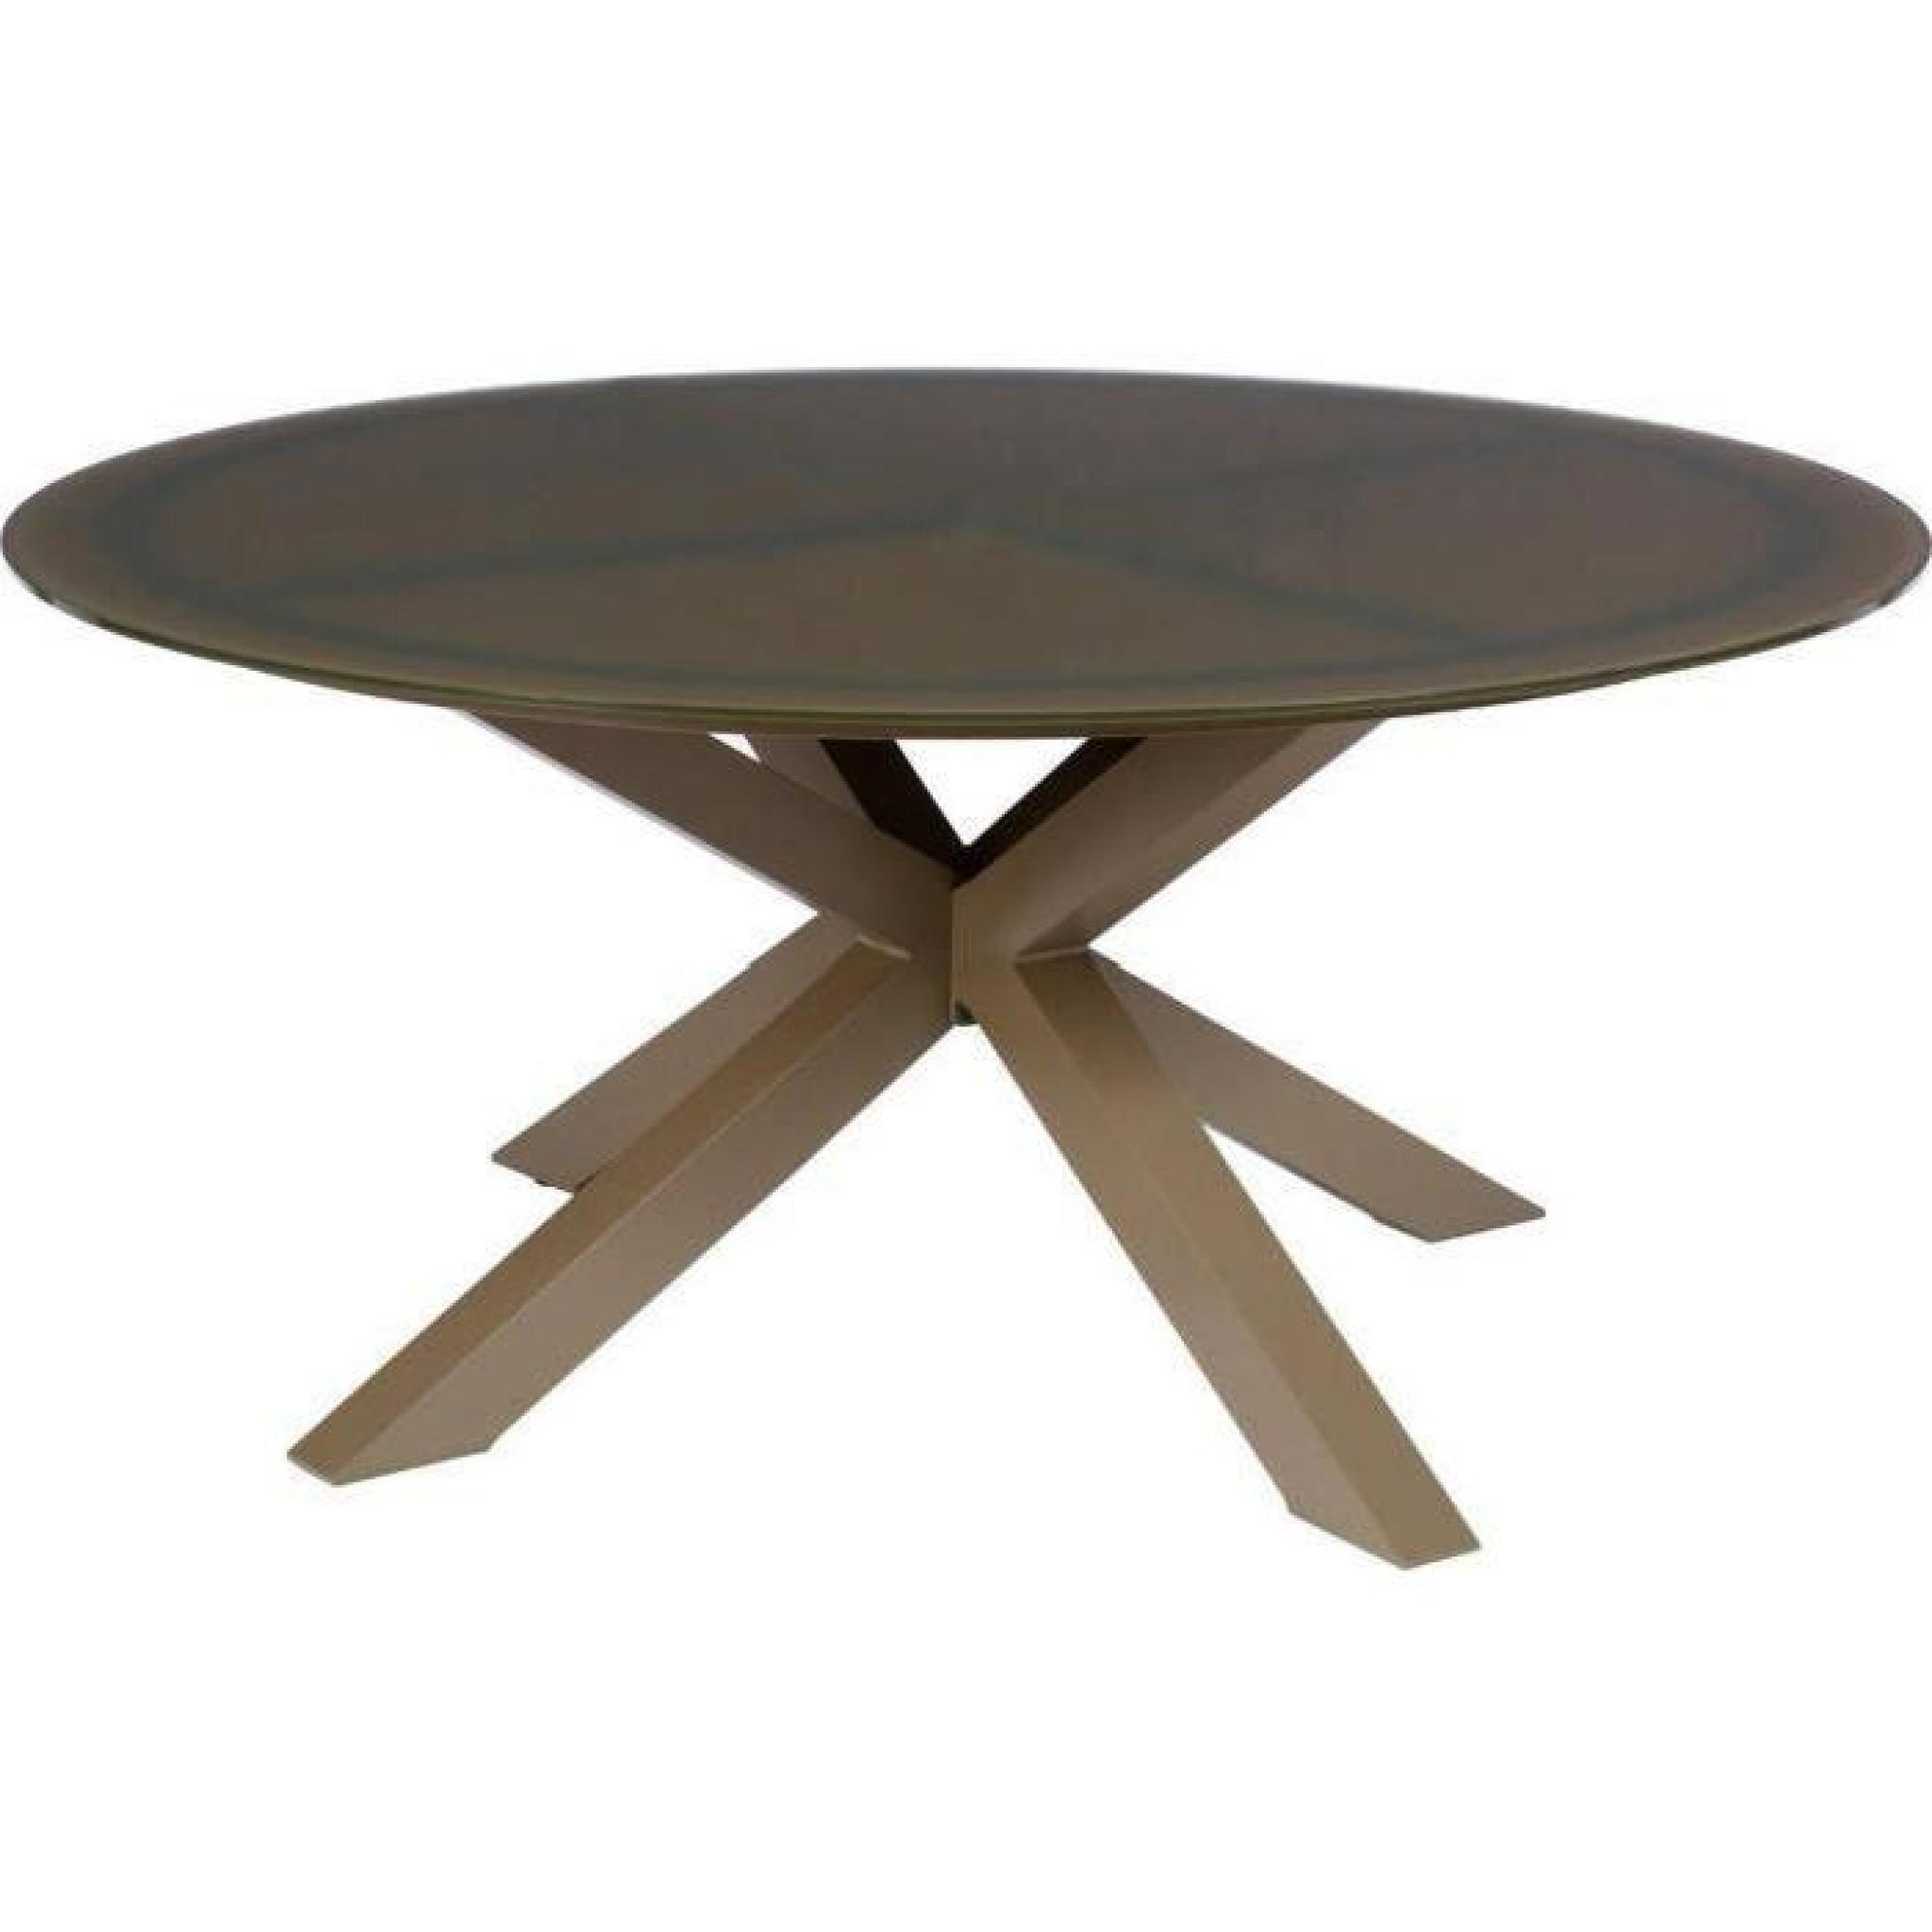 Table ronde de jardin en Aluminium coloris taupe - Dim : D 7 x H 7cm